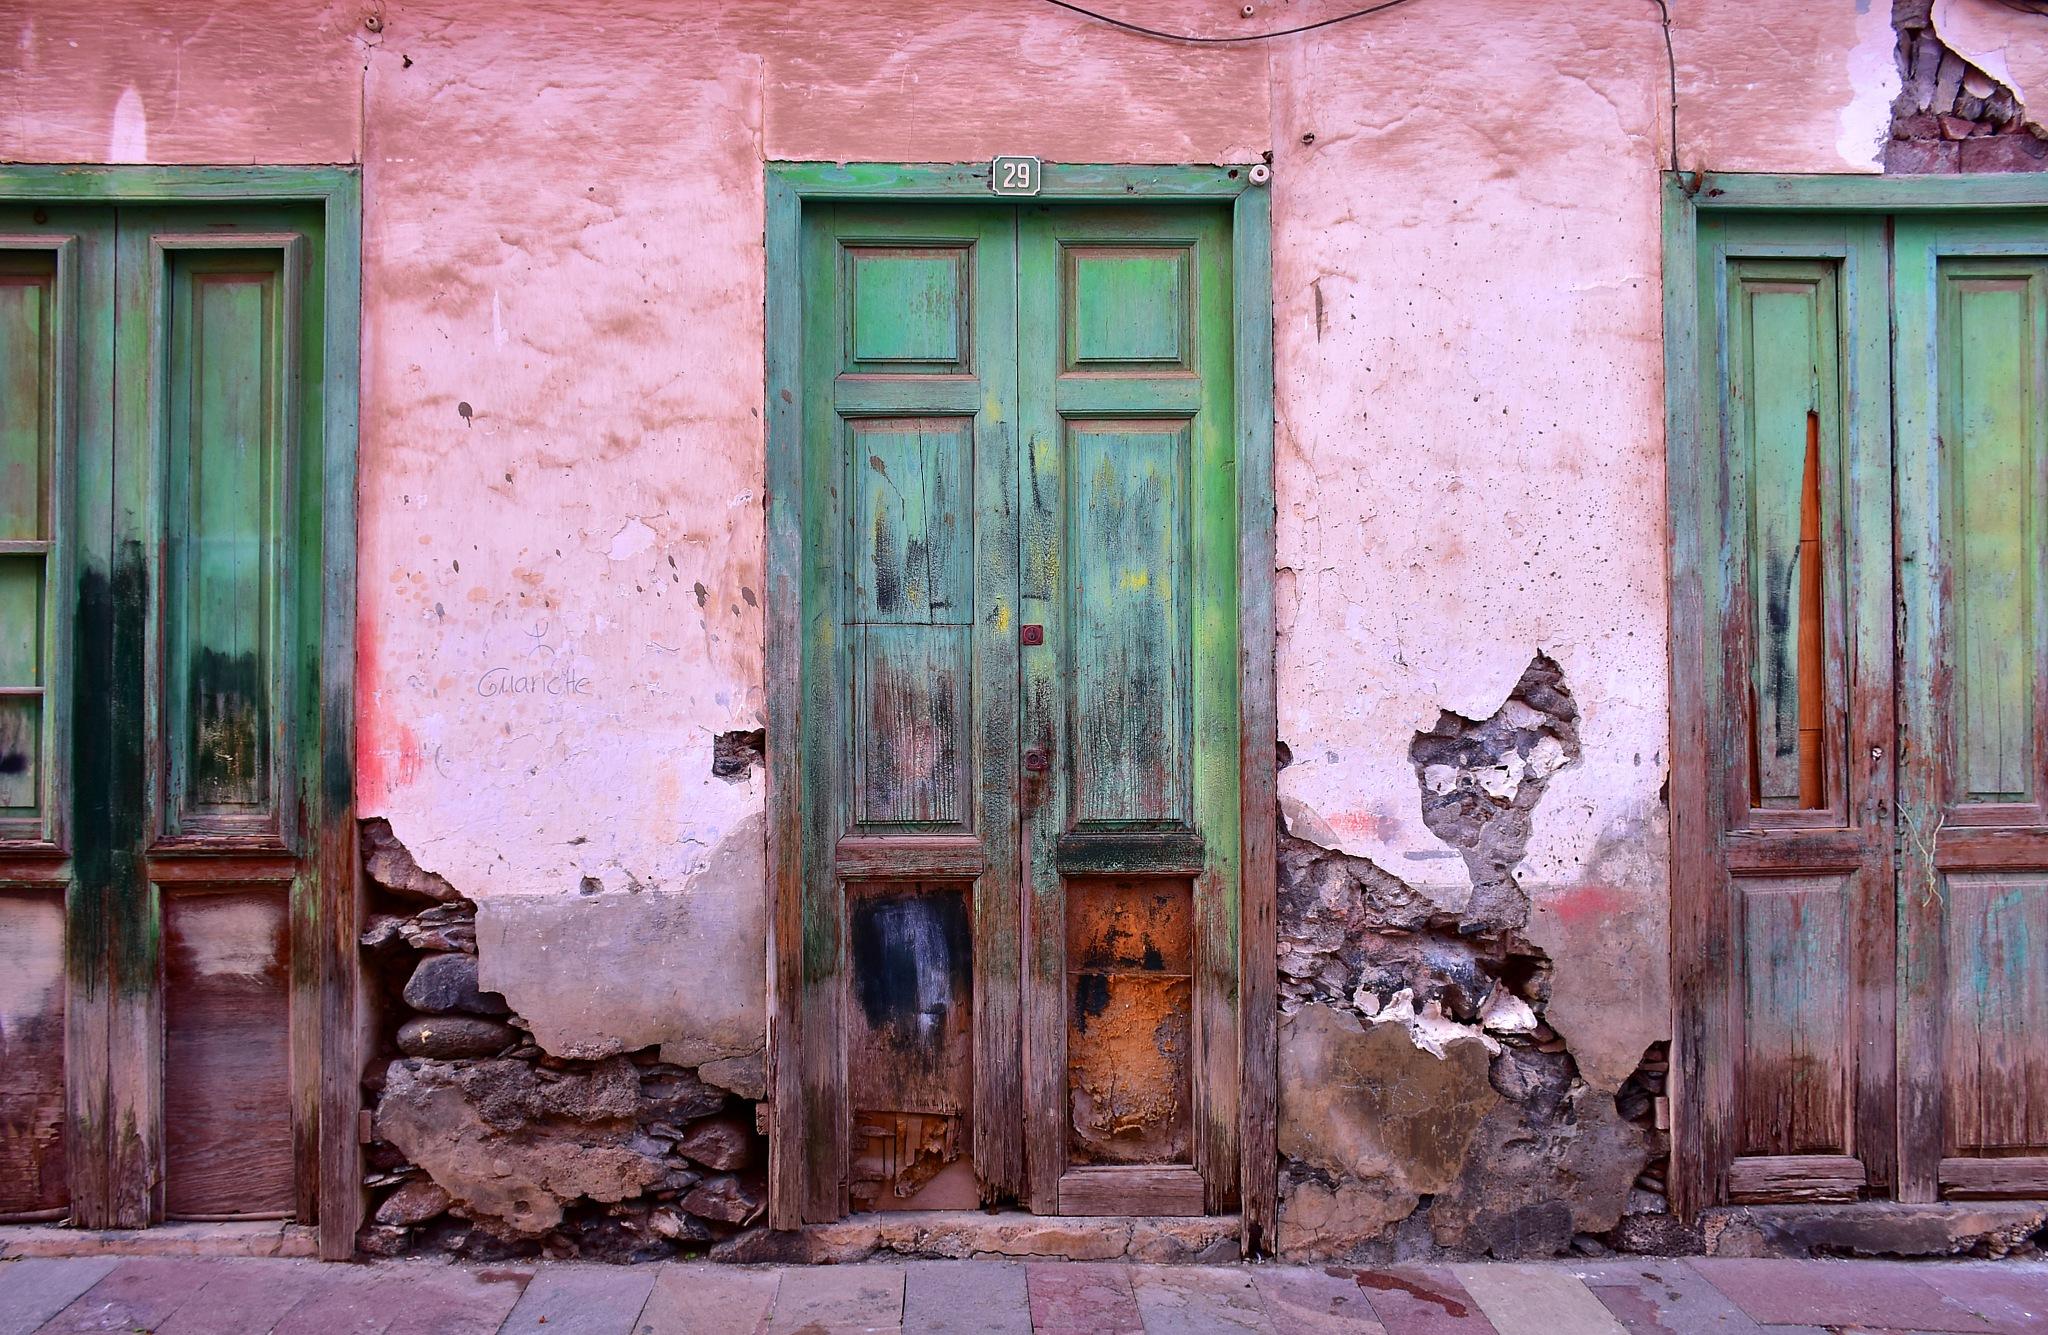 Old facade so artful by liwesta